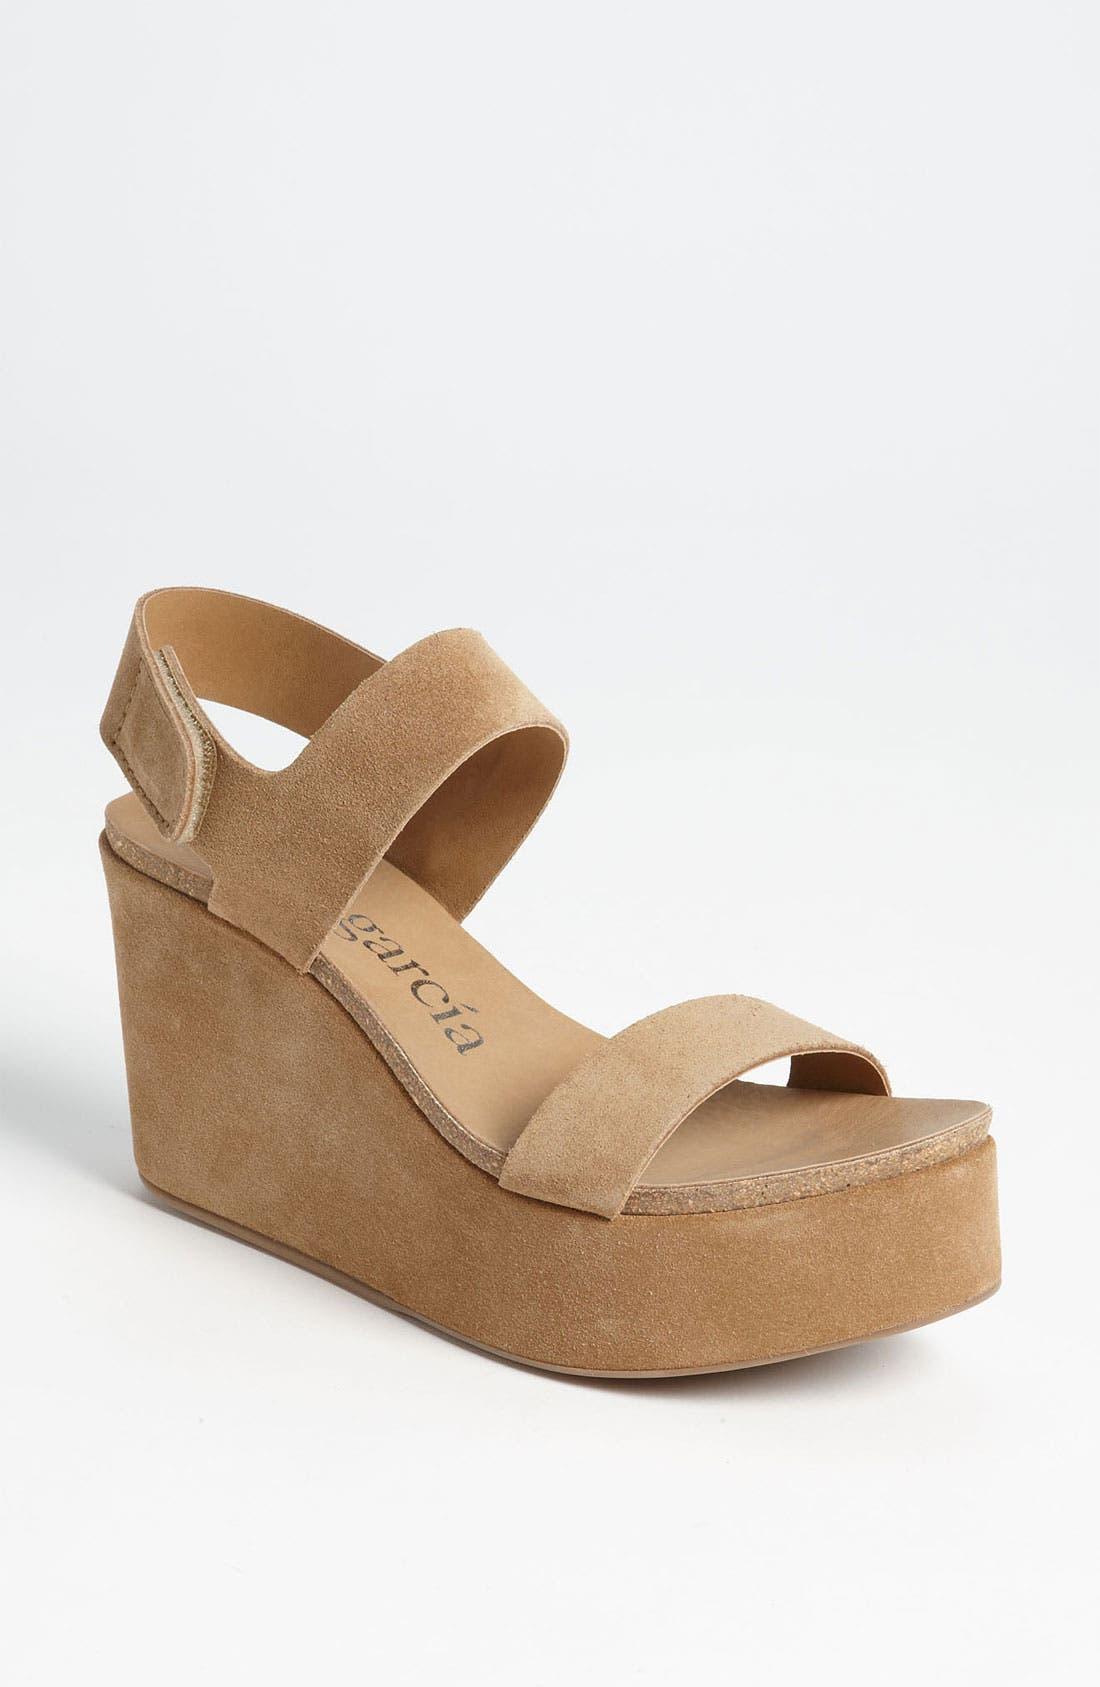 Alternate Image 1 Selected - Pedro Garcia 'Dakota' Wedge Sandal (Exclusive Color)